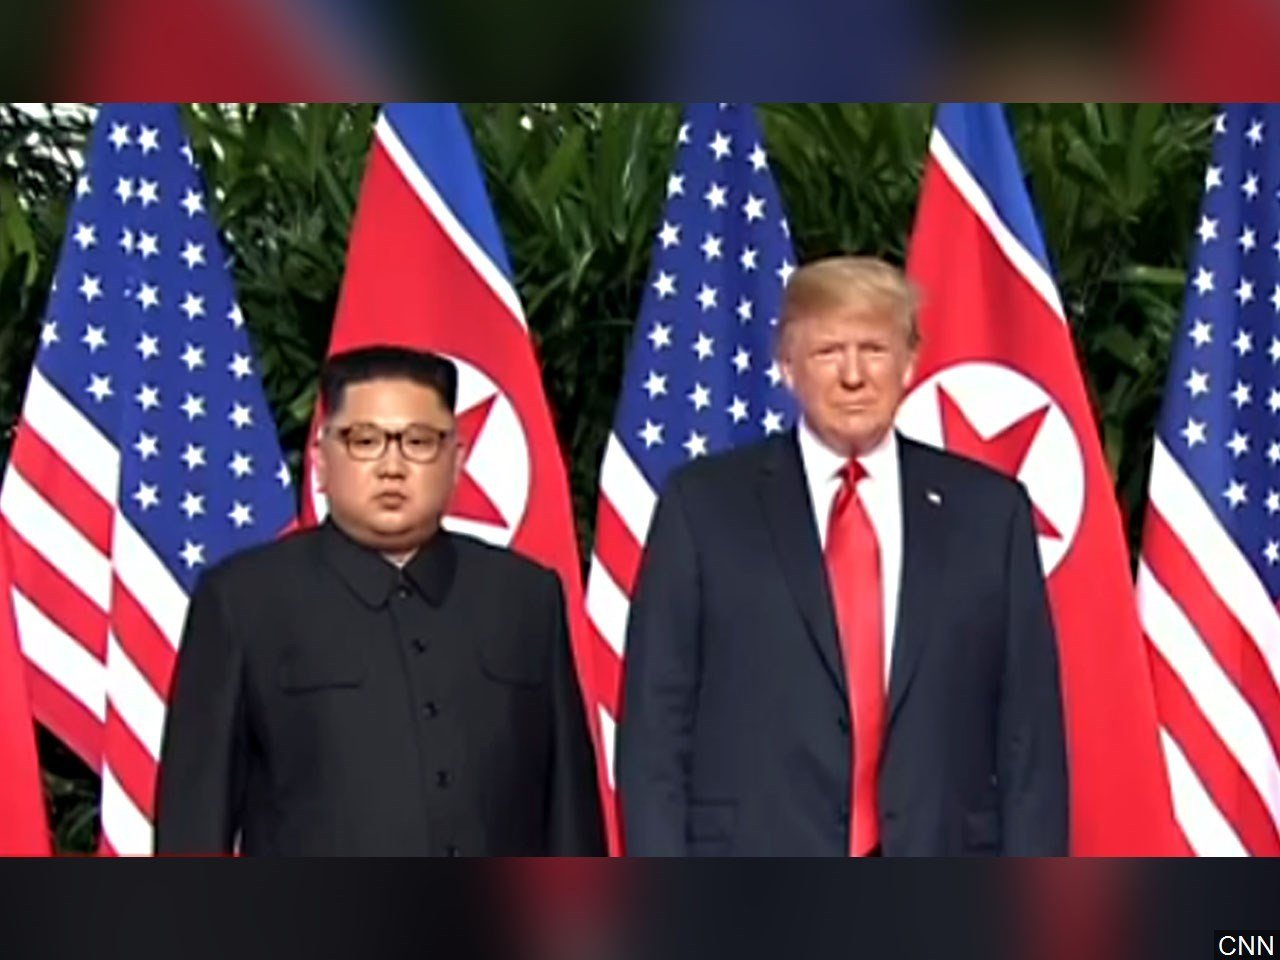 Courtesy of MGN Online / CNN